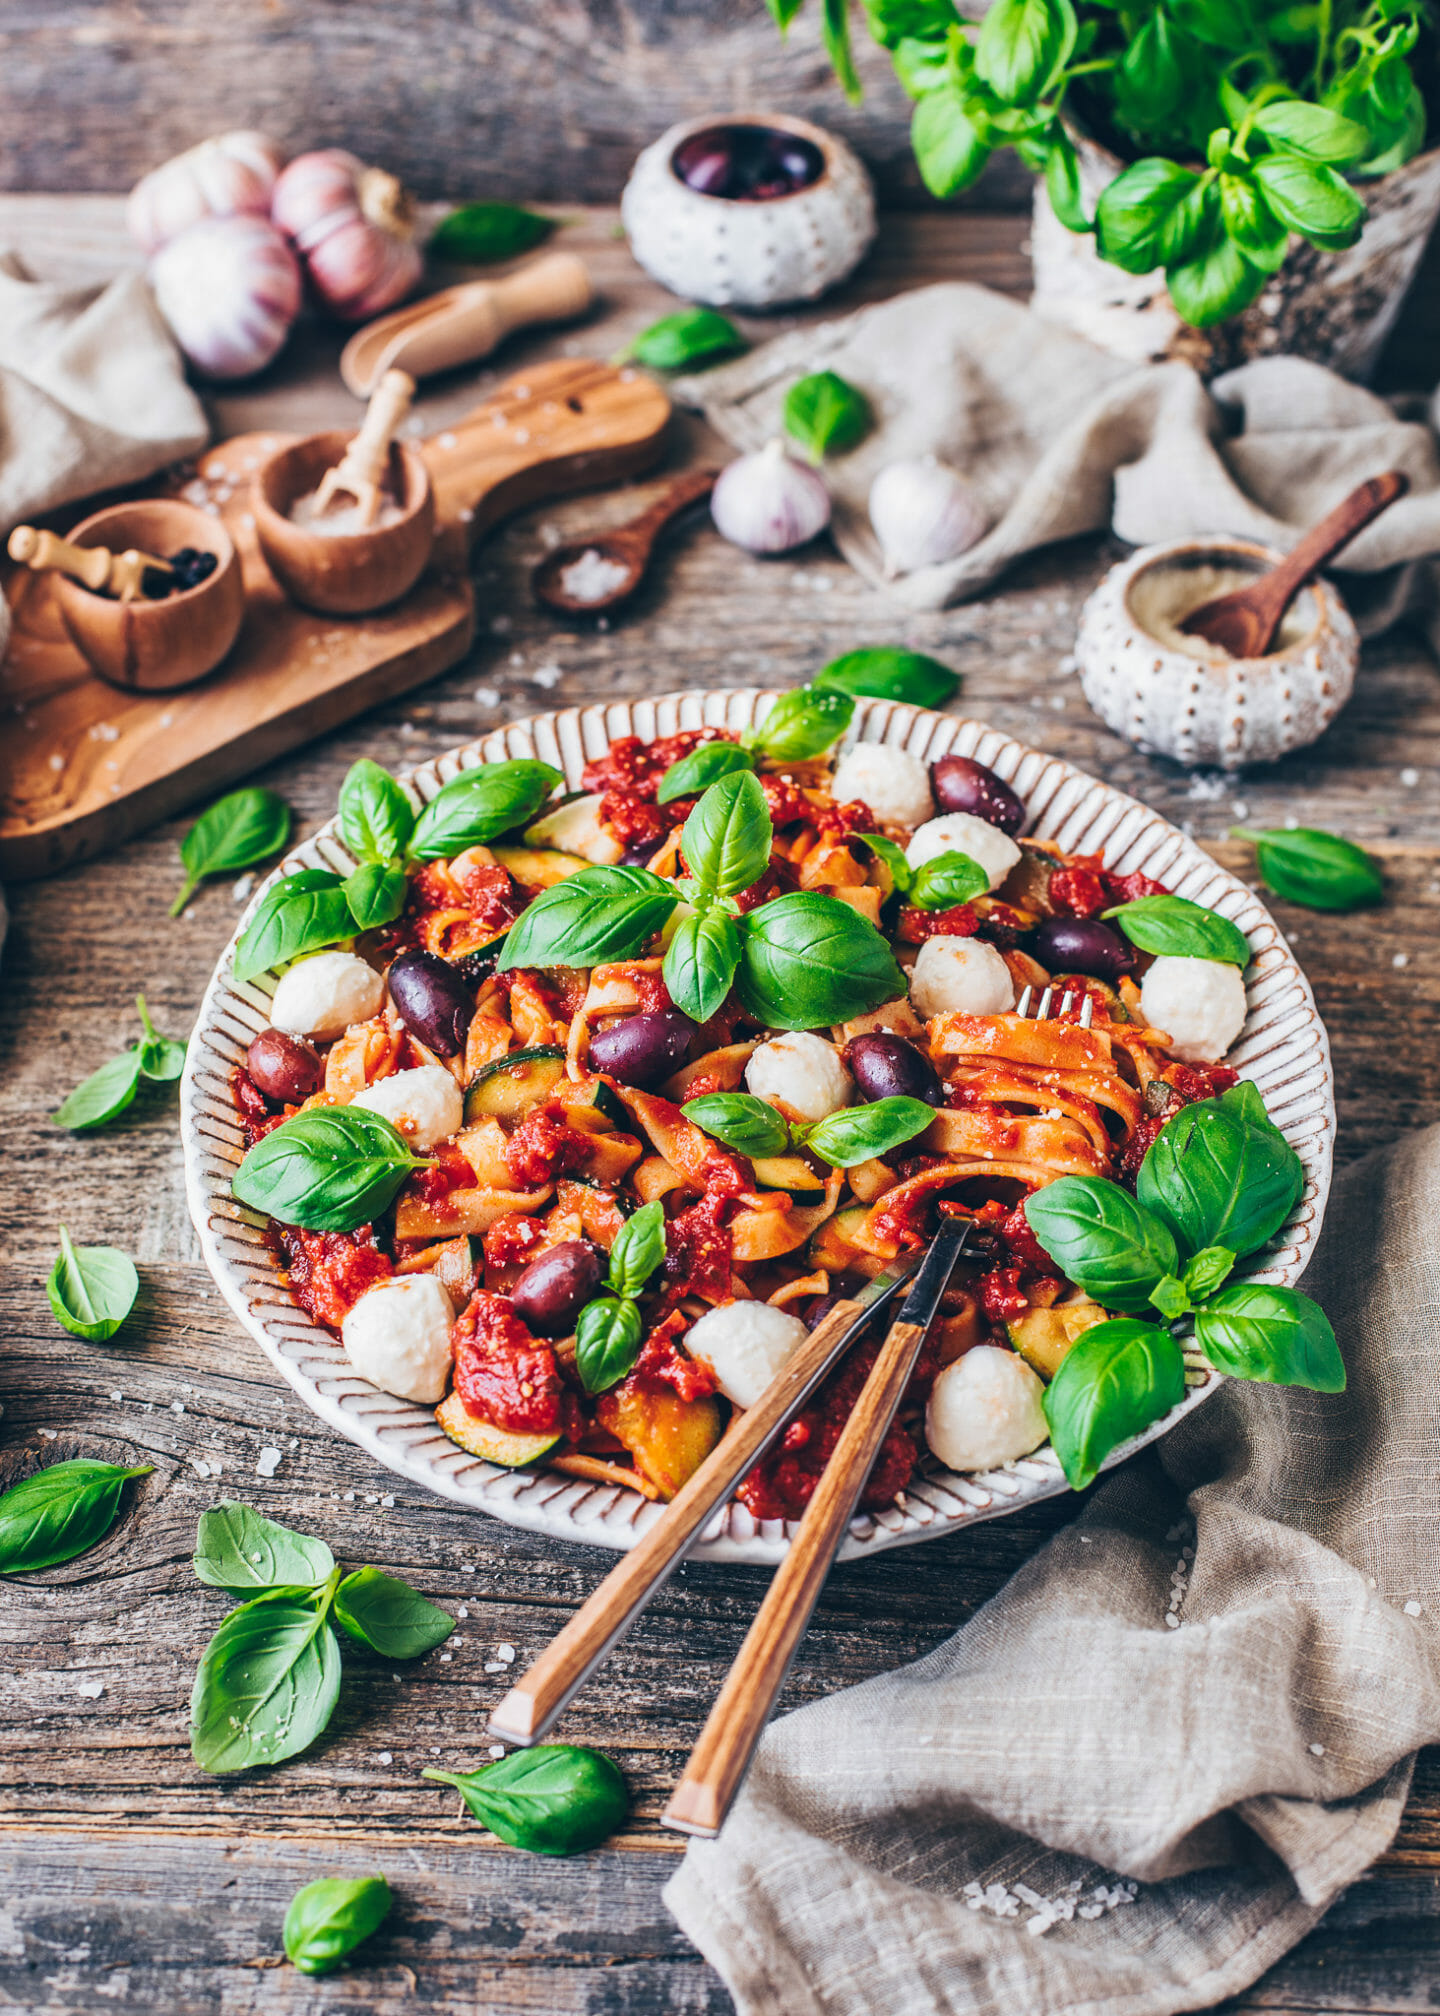 Pasta with Mozzarella, Parmesan, Olives, and Basil (Vegan One-Pot Recipe)